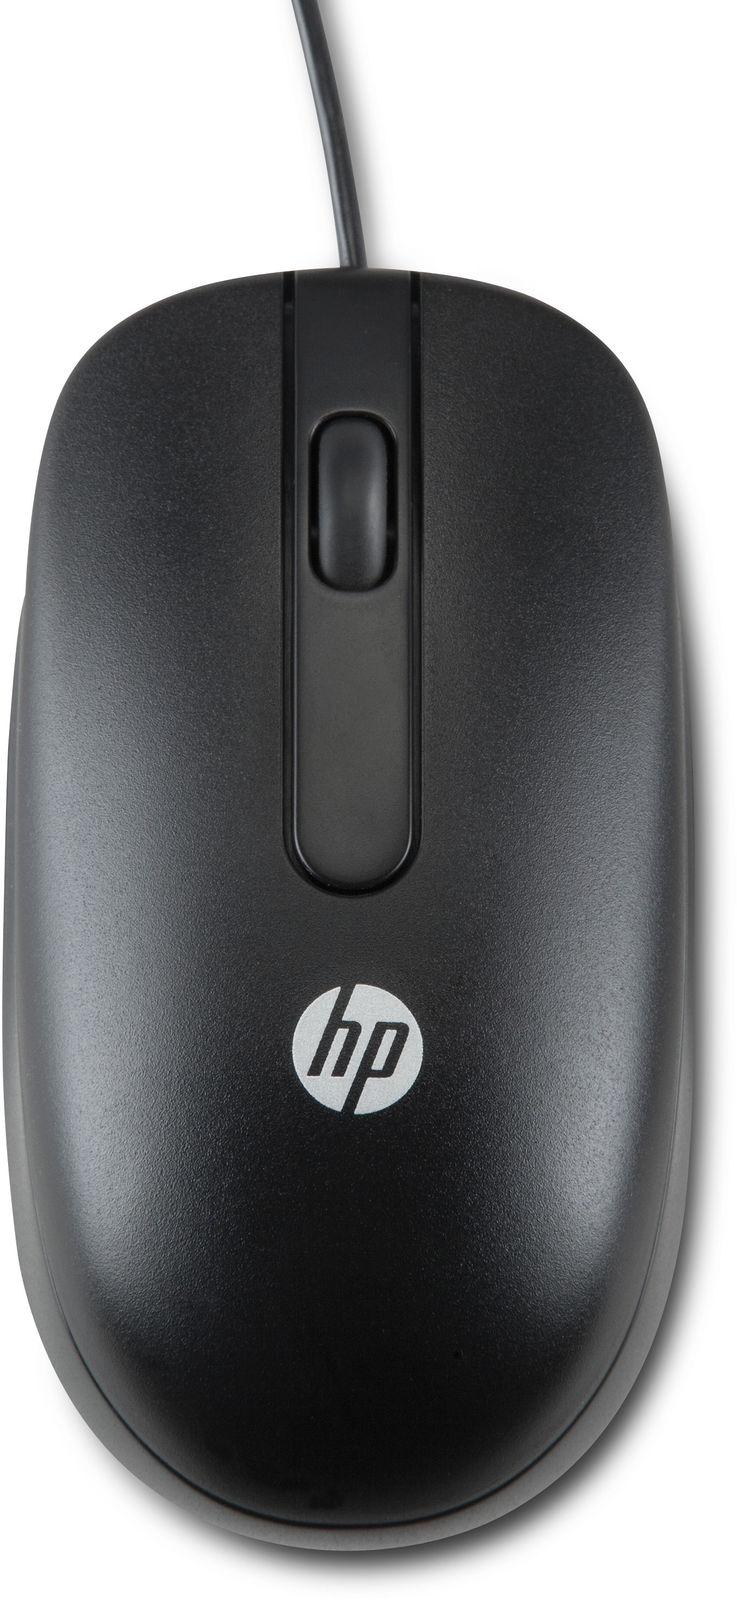 HP USB Optical Scroll mouse Laser 1000 DPI Ambidextrous